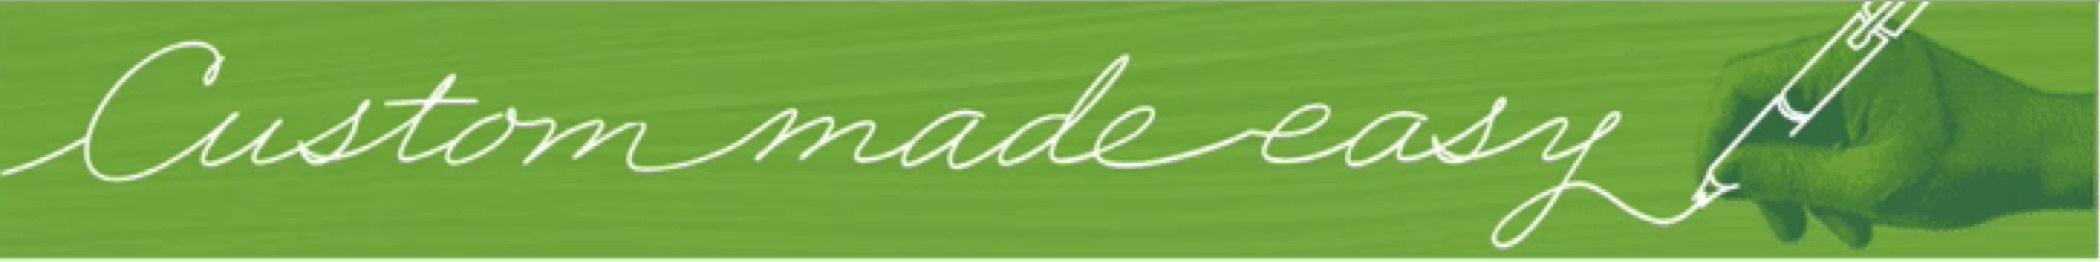 "Green banner ad reads ""Custom made easy."""